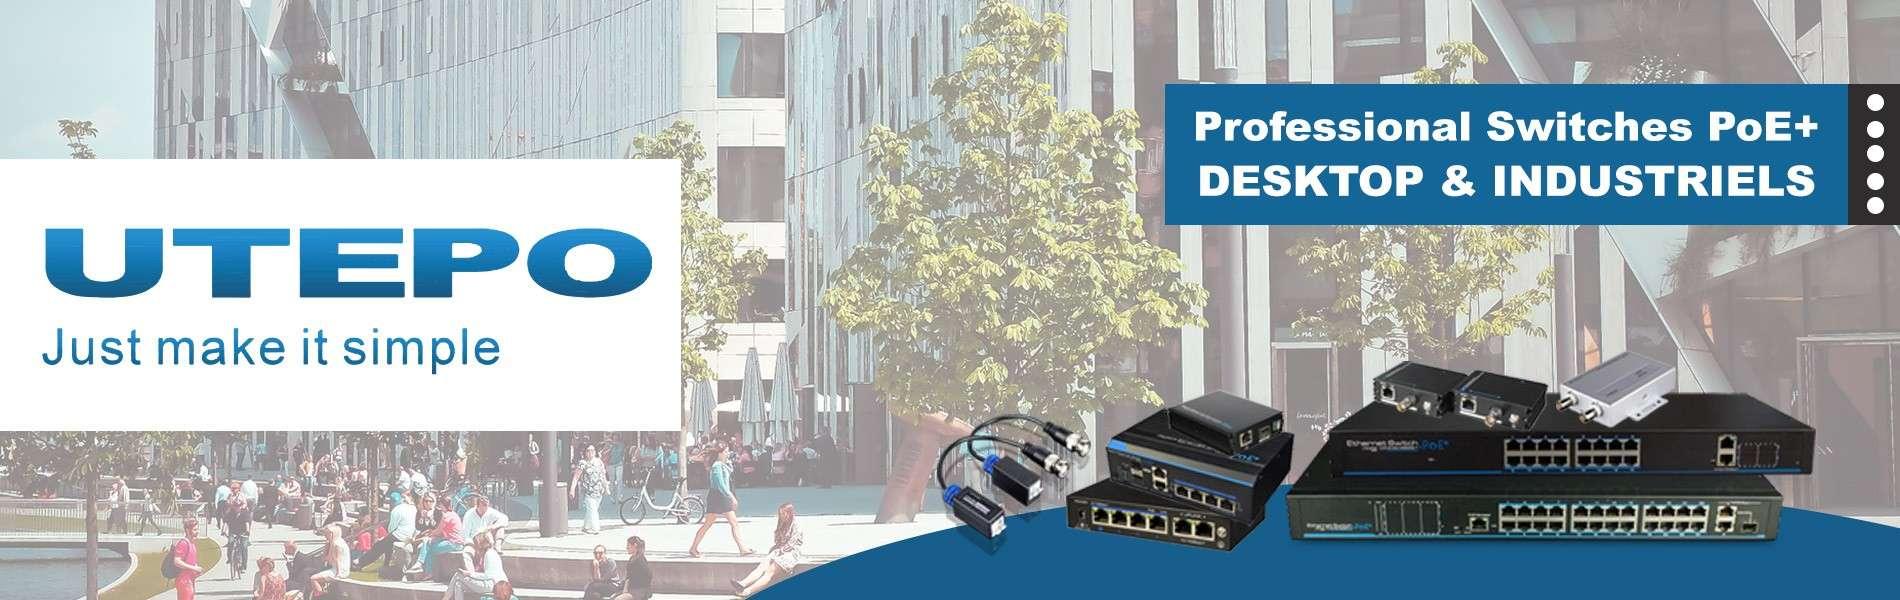 Gamme de switchs UTEPO professionnels